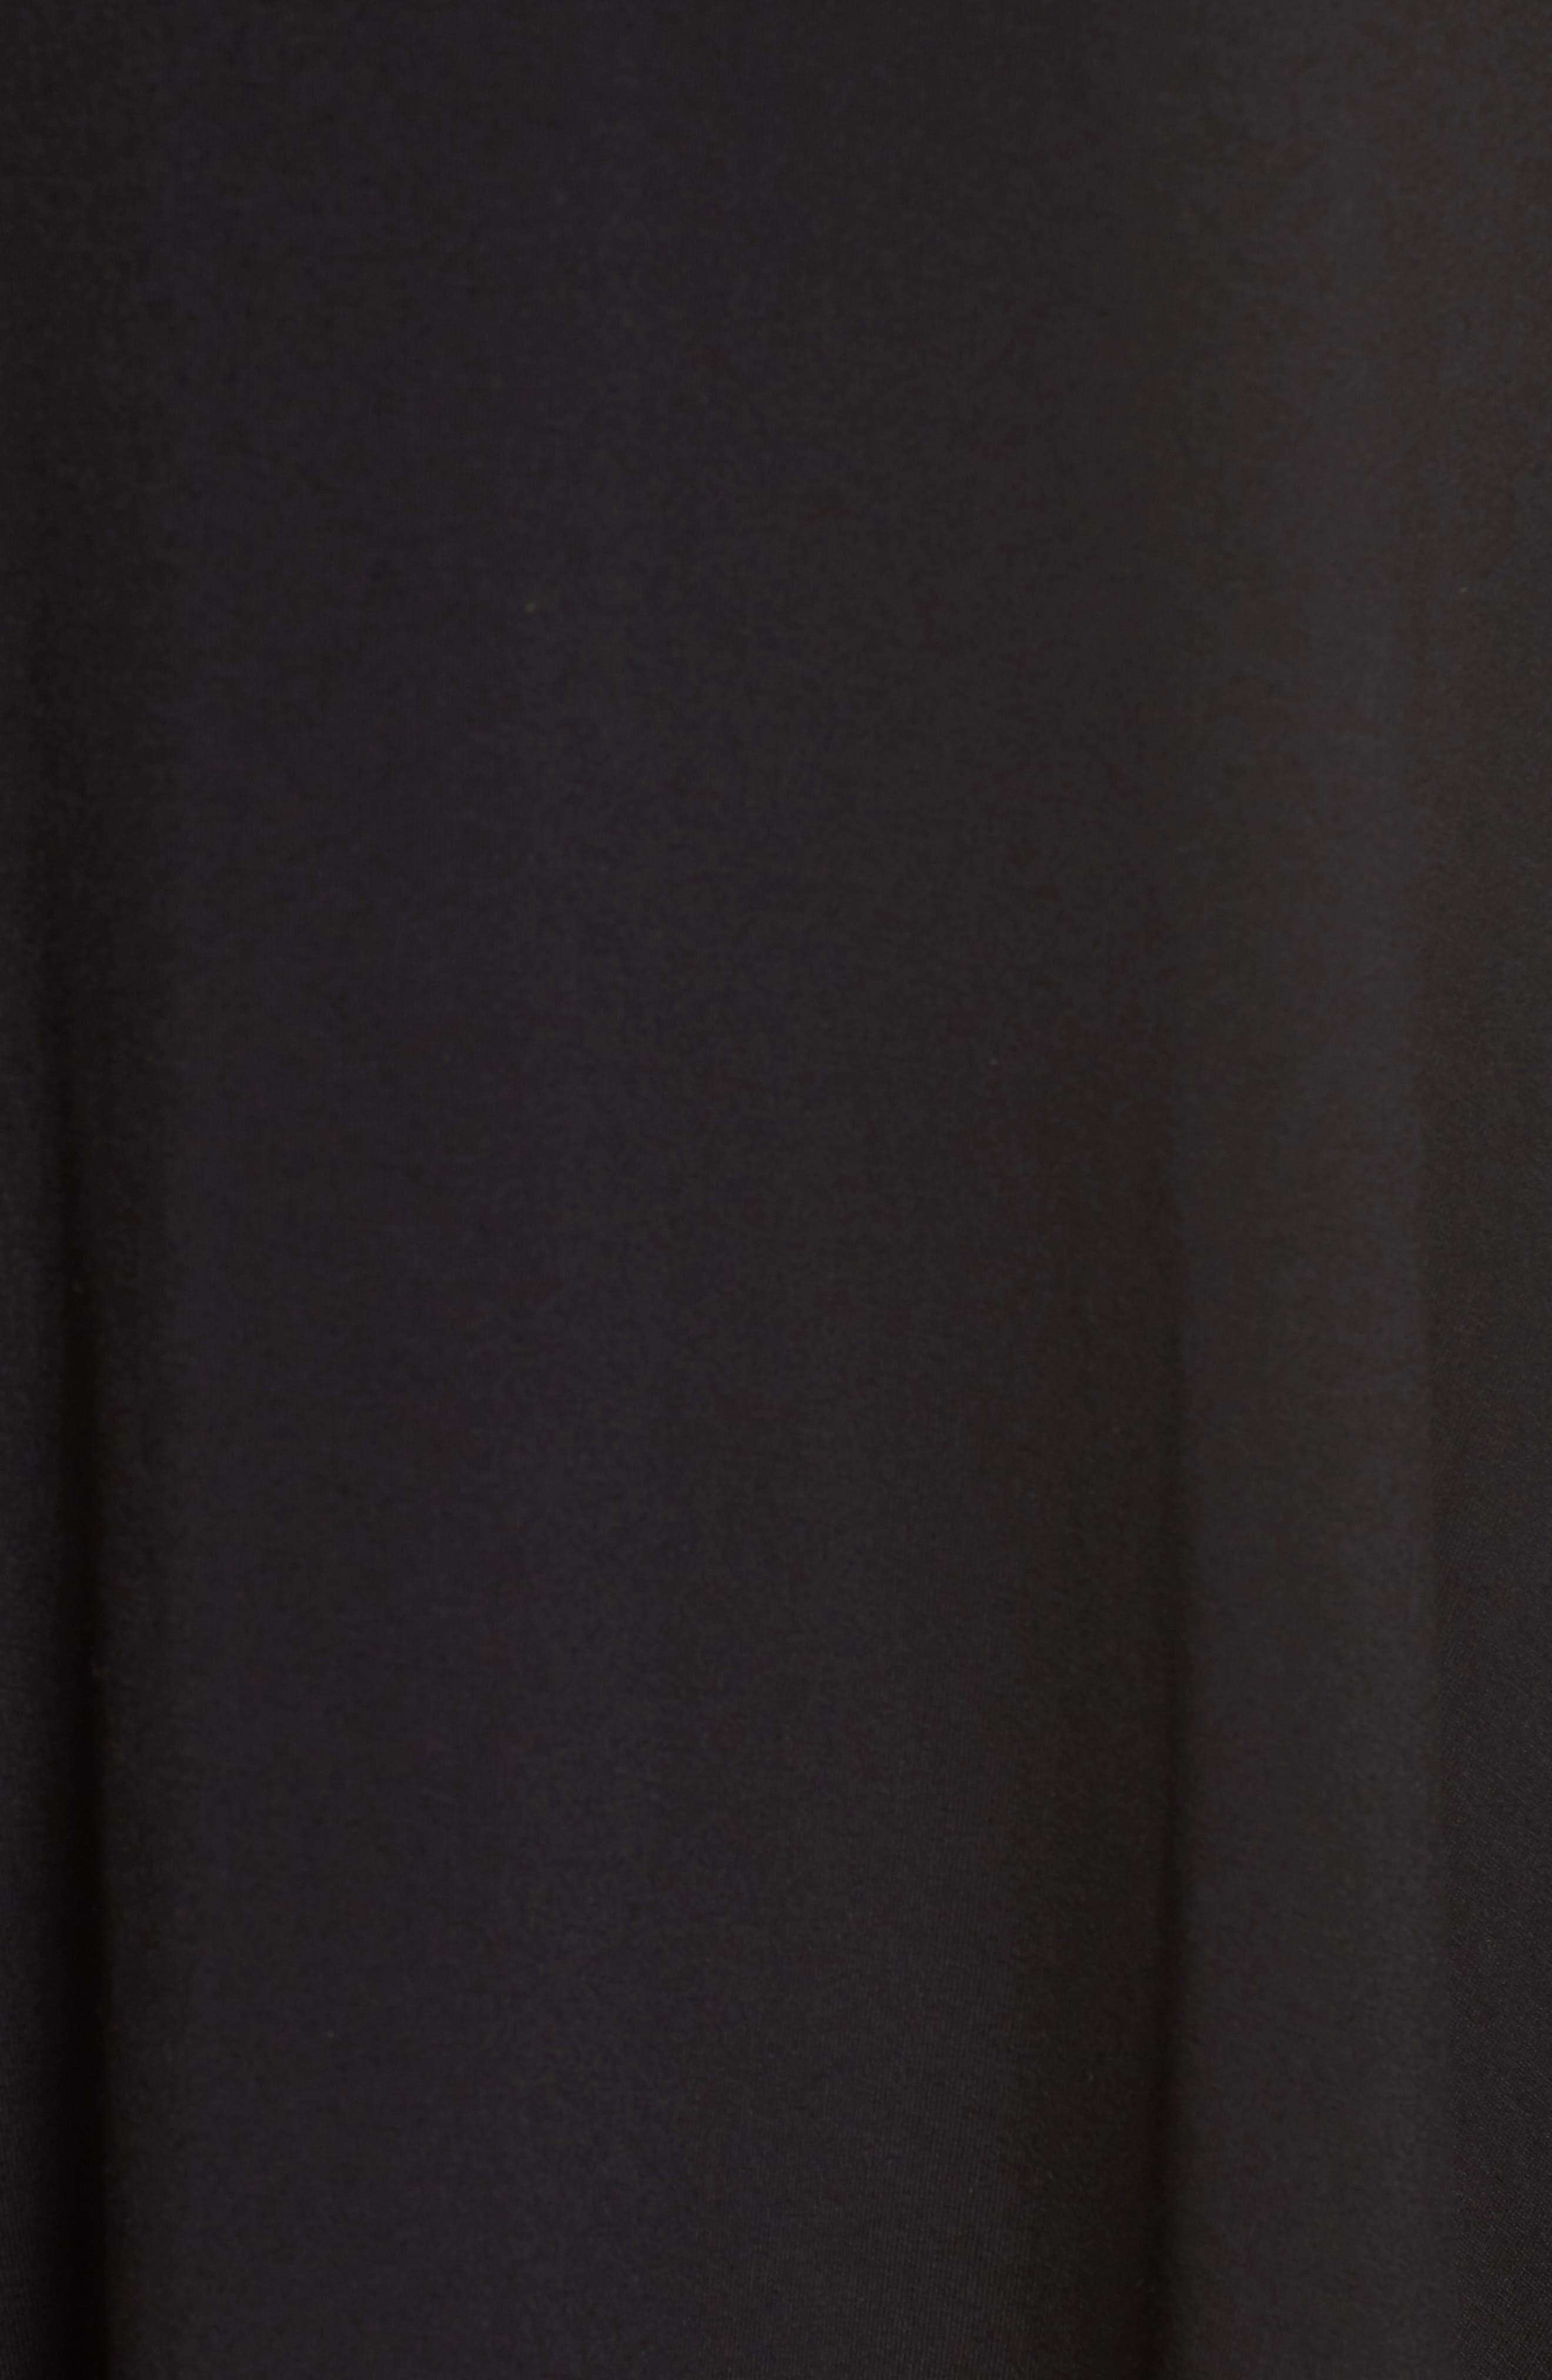 Stretch Knit Shift Dress,                             Alternate thumbnail 5, color,                             RICH BLACK